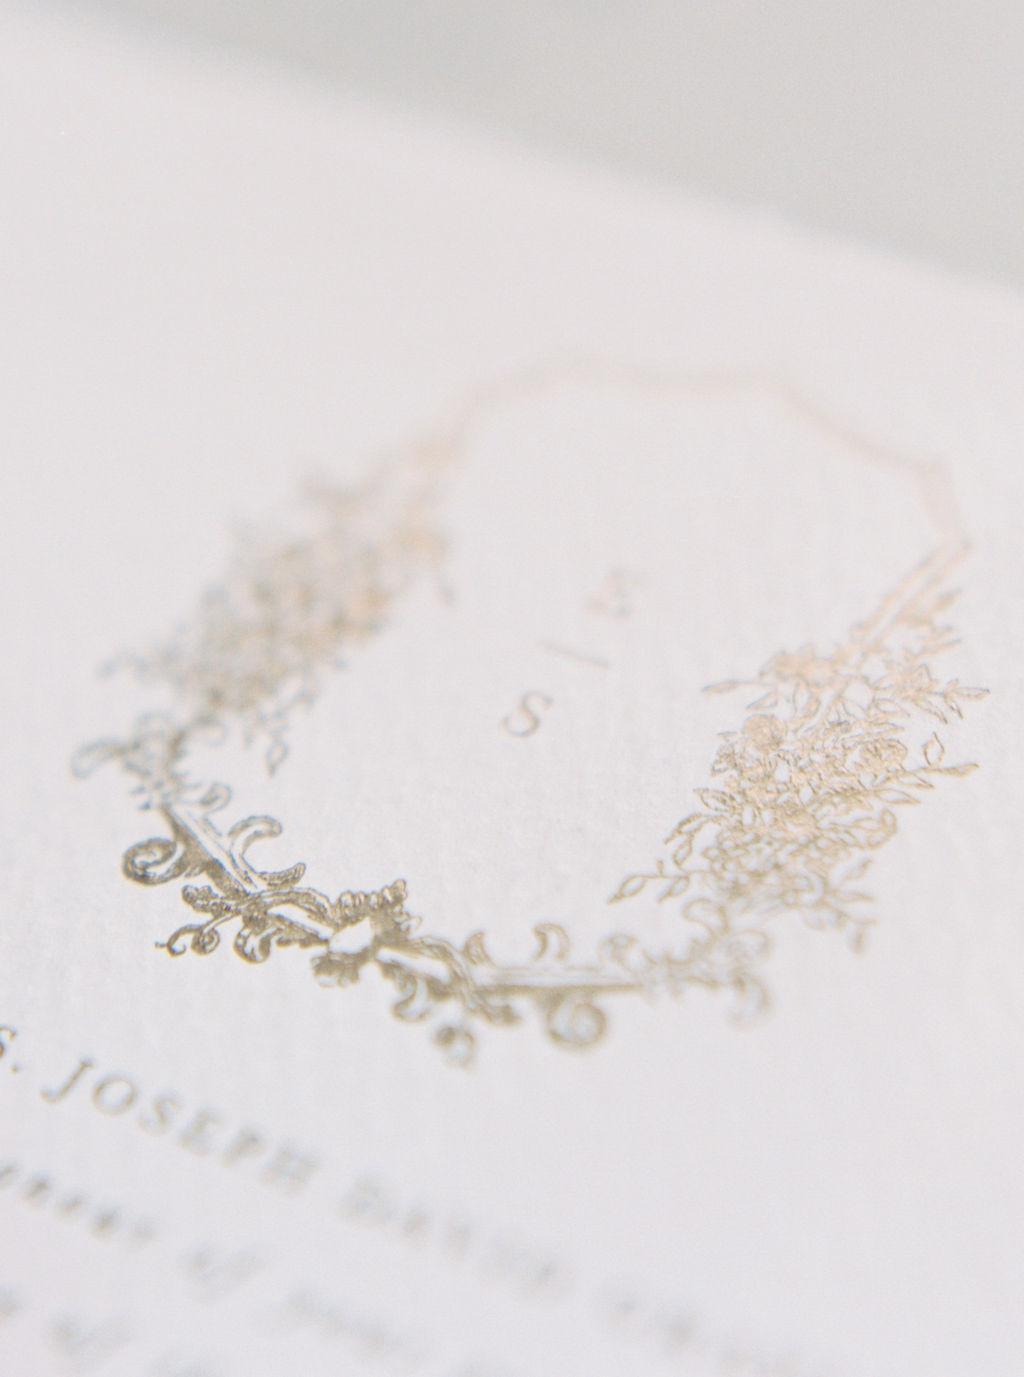 Foil printing example for semi-custom wedding invitations.